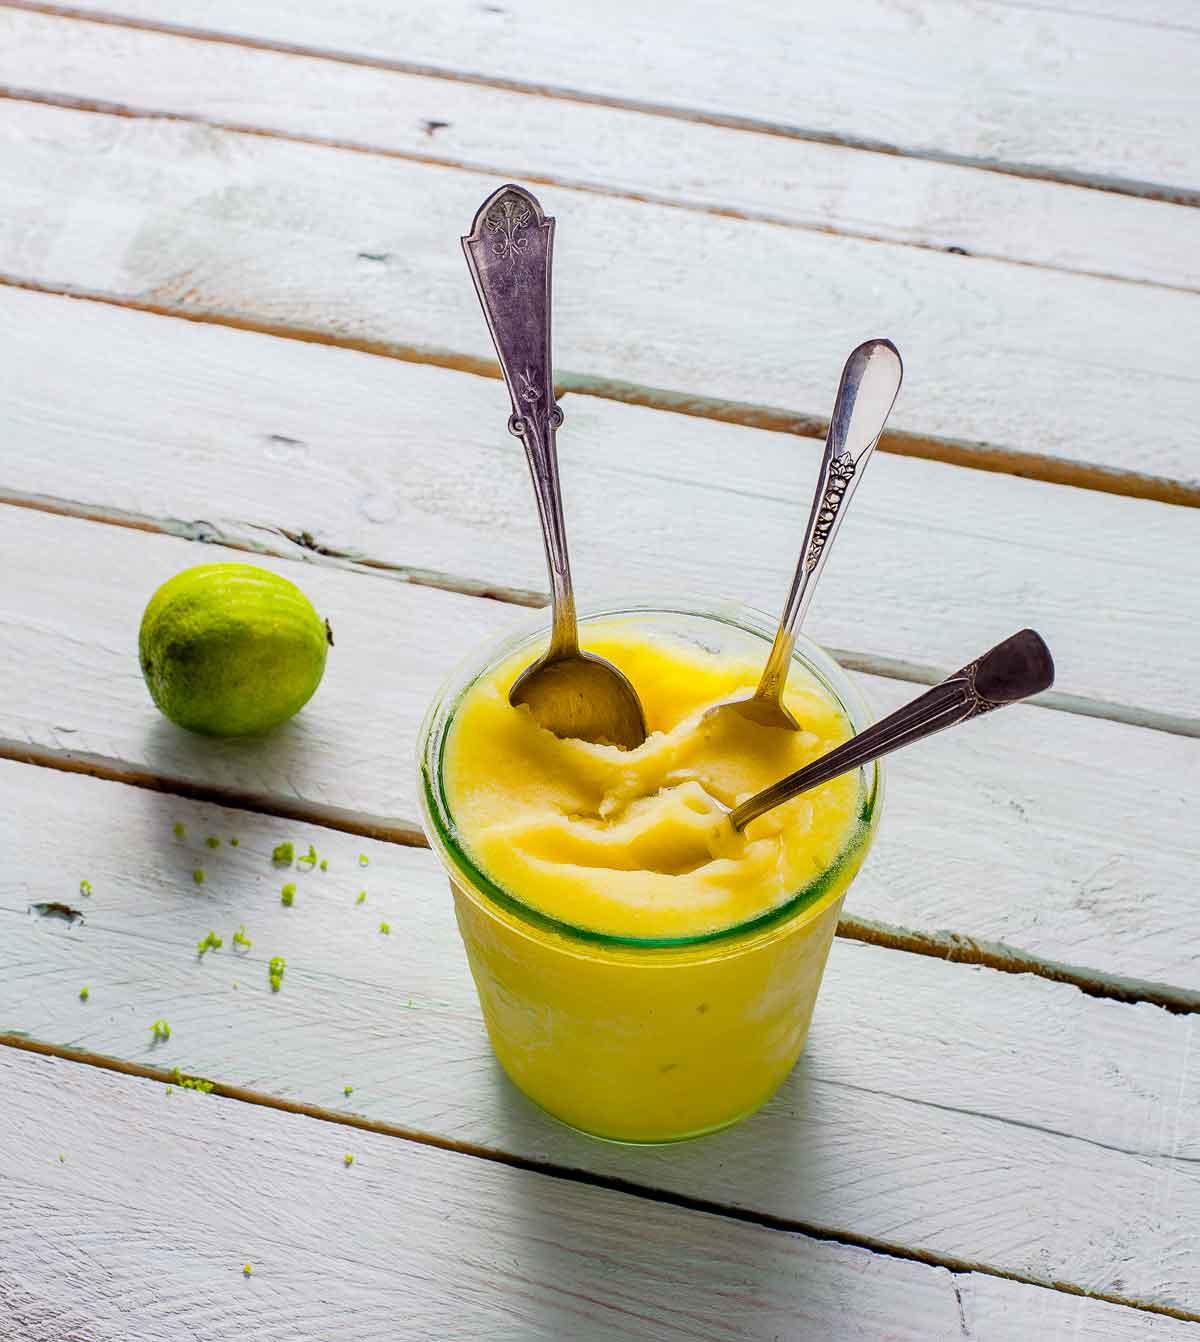 mango-limoen-sorbet_altijd_ijs_marleenvissser_sharelovenotsecrets-nl_